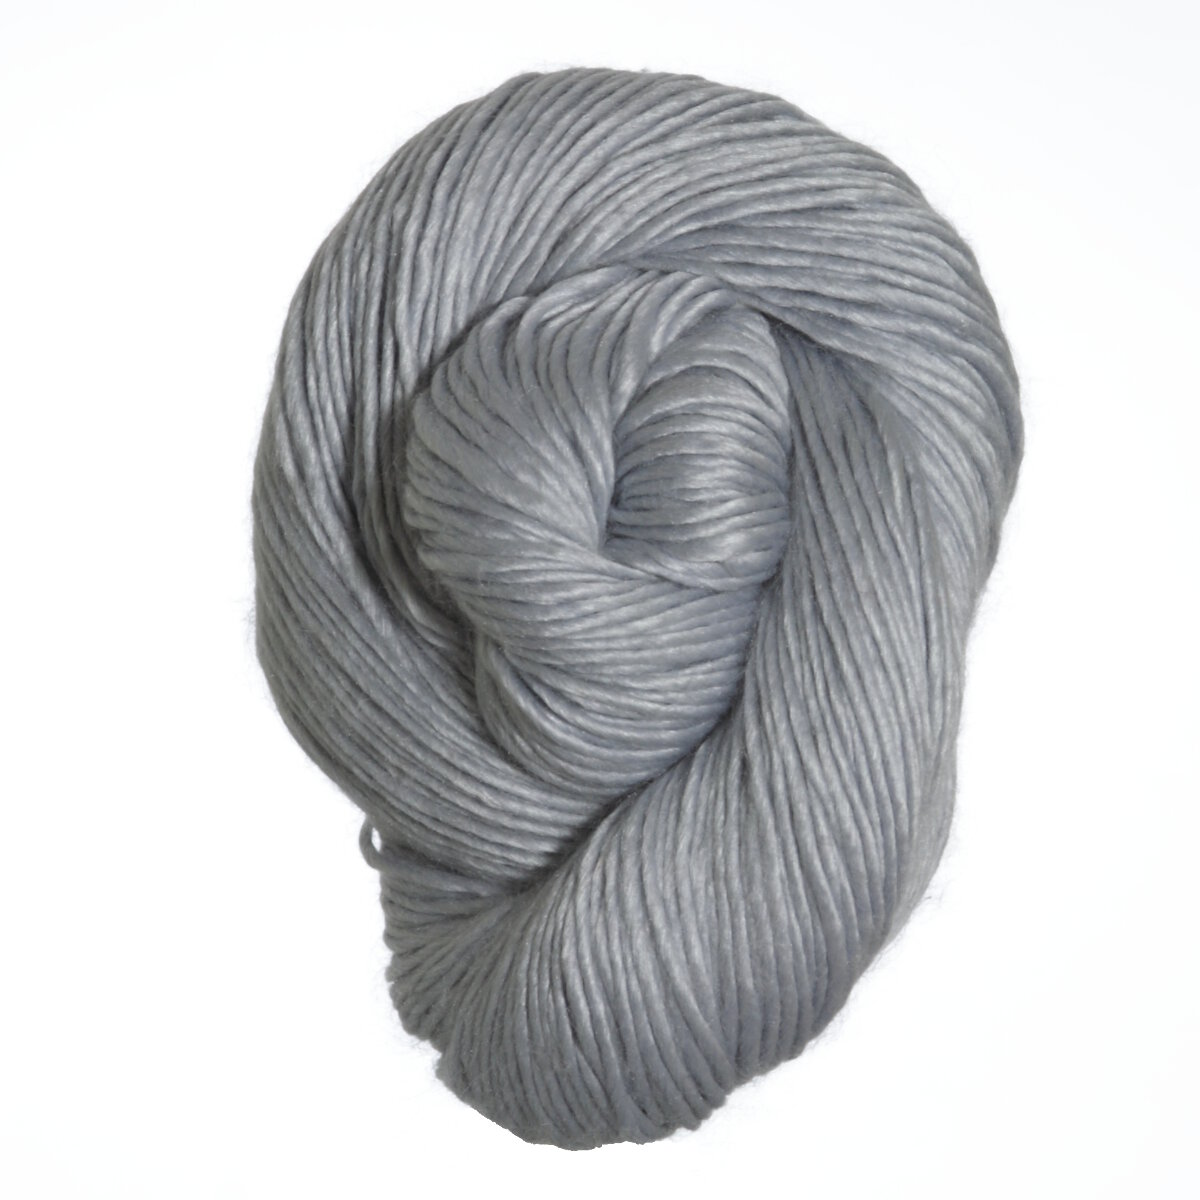 Fyberspates Scrumptious Dk Worsted Yarn 112 Silver At